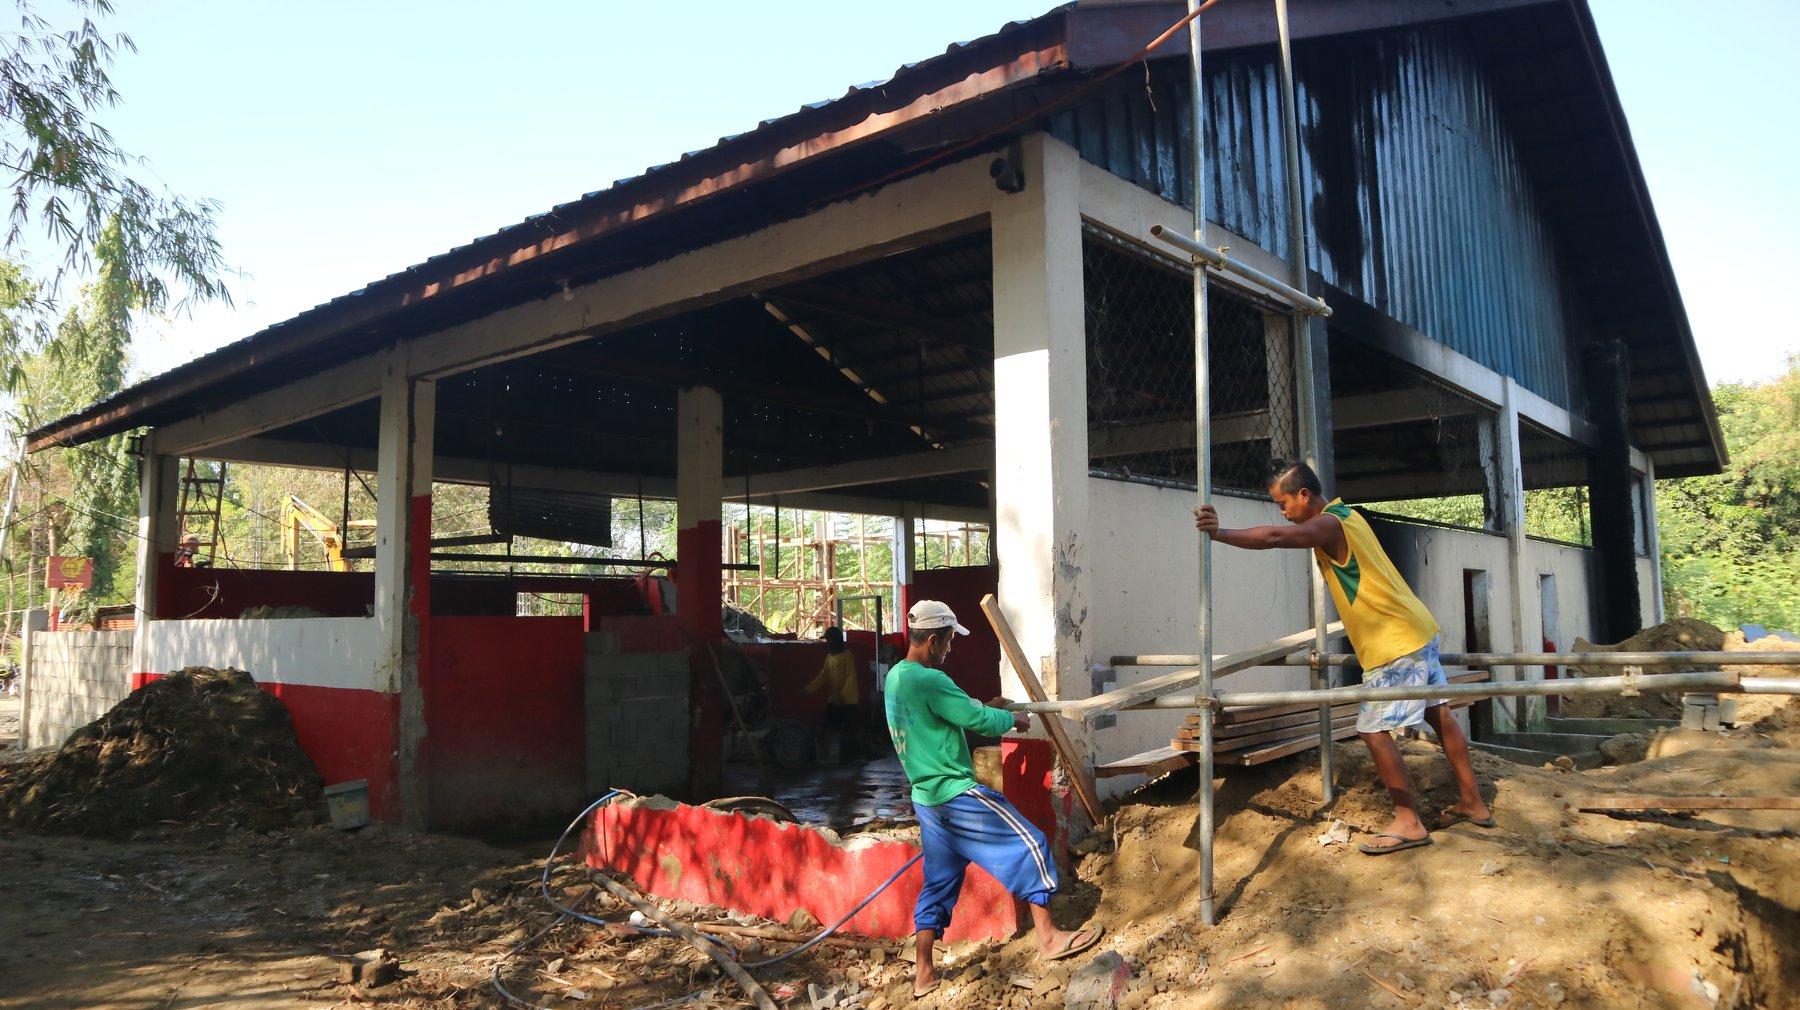 ONGOING: Municipal Slaughterhouse under expansion, renovation